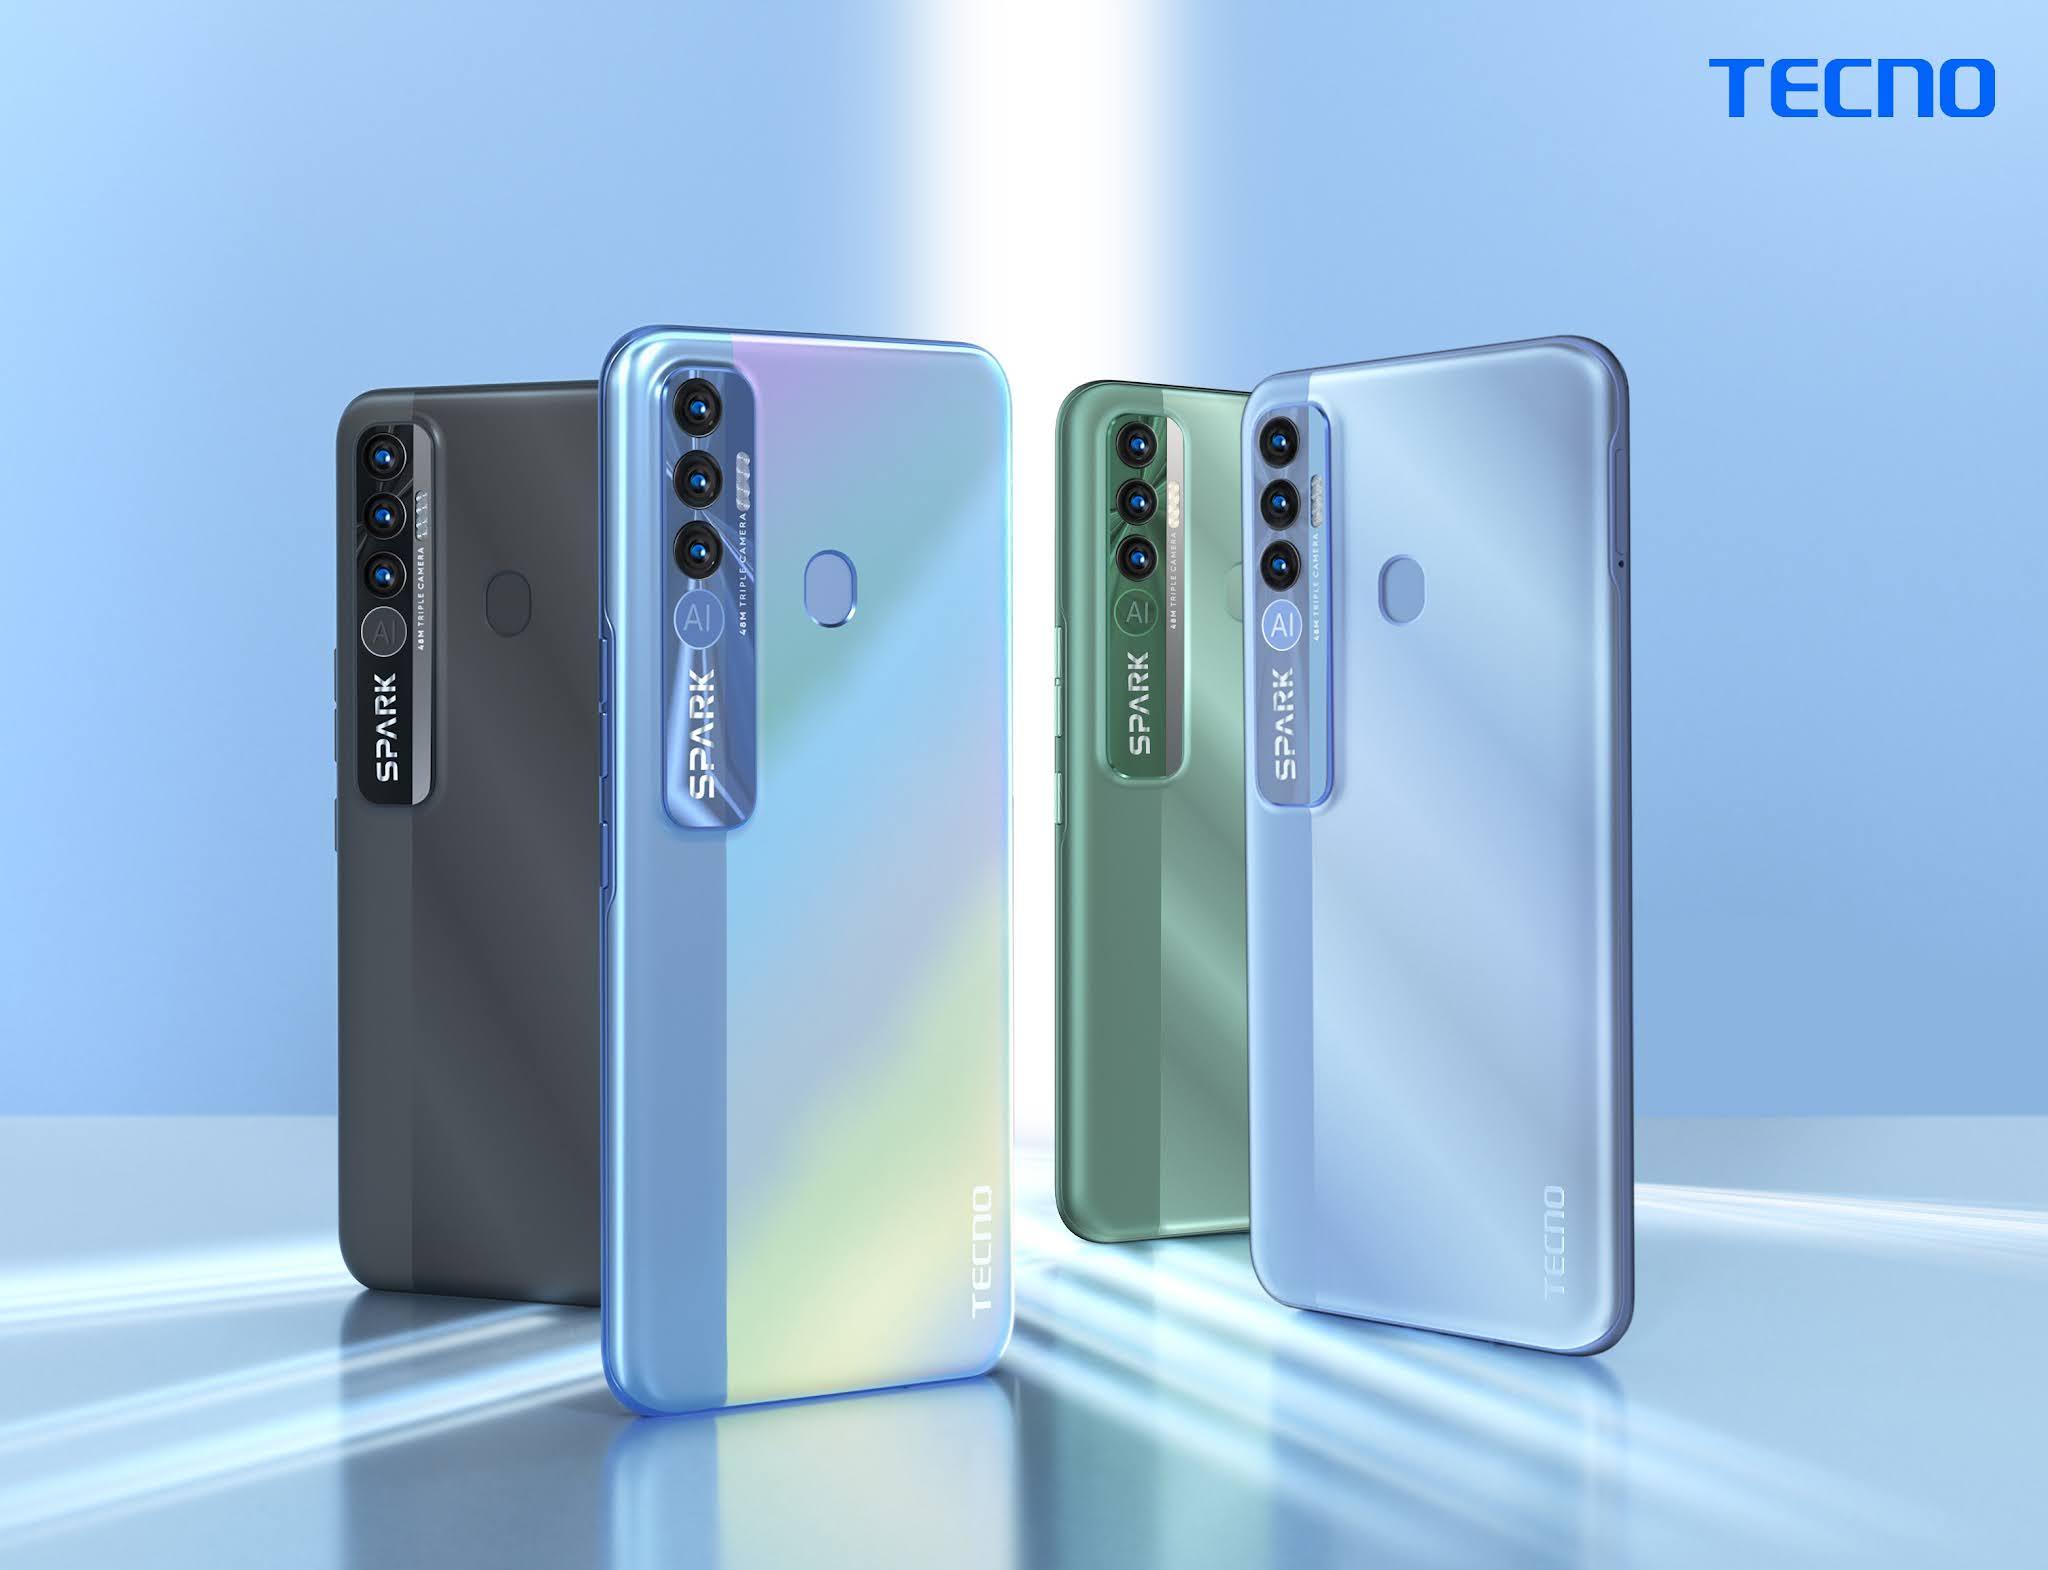 TECNO Mobile Smartphones for Online Learning